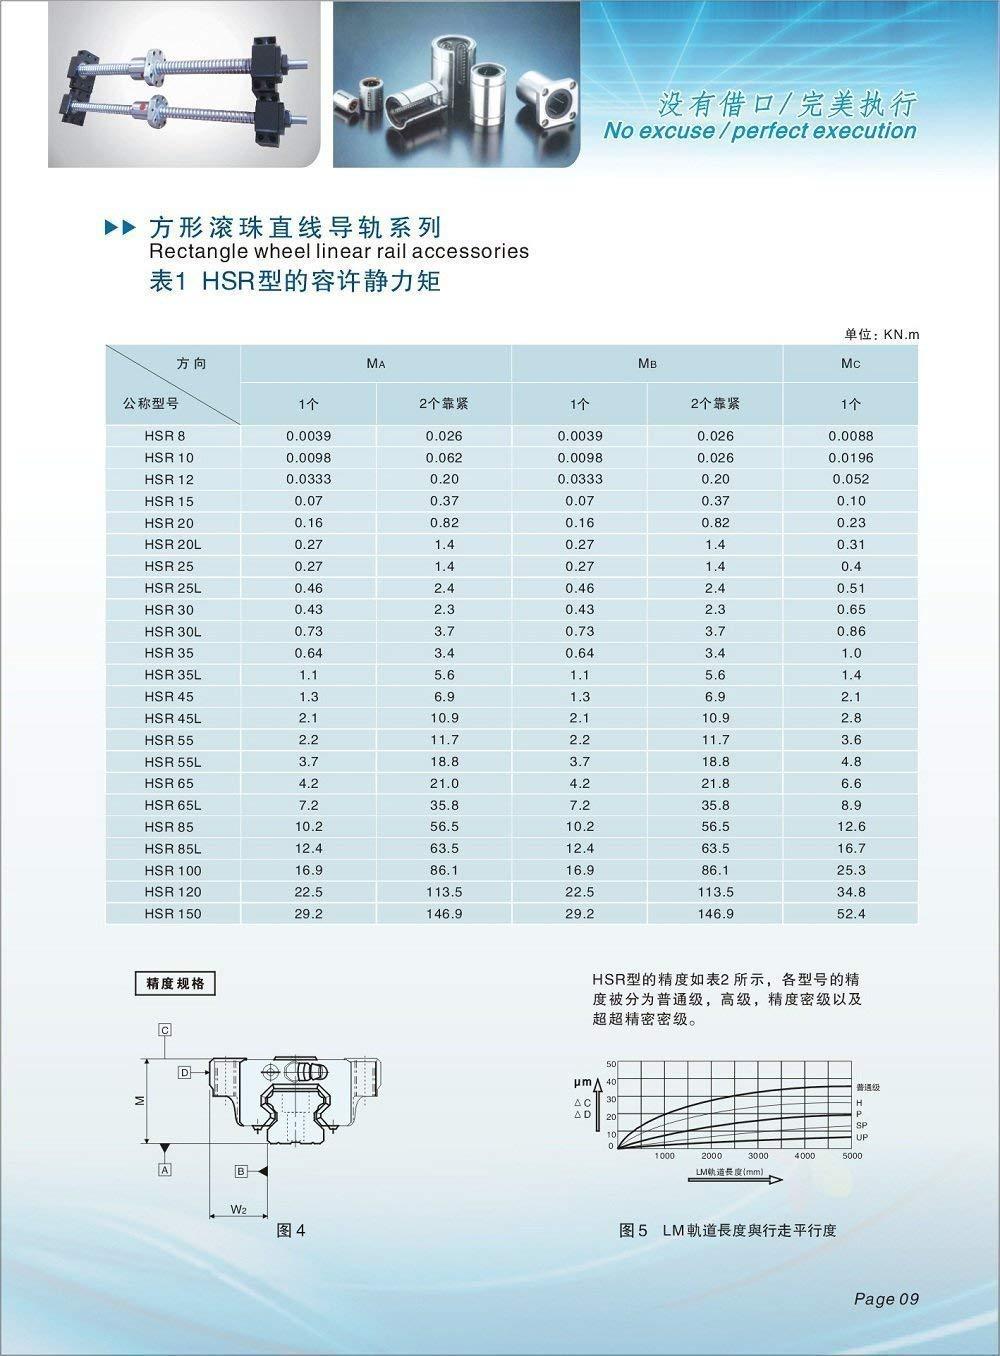 4 x HSR20CR Bloque de cojinete de carro de tipo cuadrado TEN-HIGH CNC 2 kits HSR20-1100mm 43.31pulgadas 2 x Carril de gu/ía lineal//Linear Guideway Rail